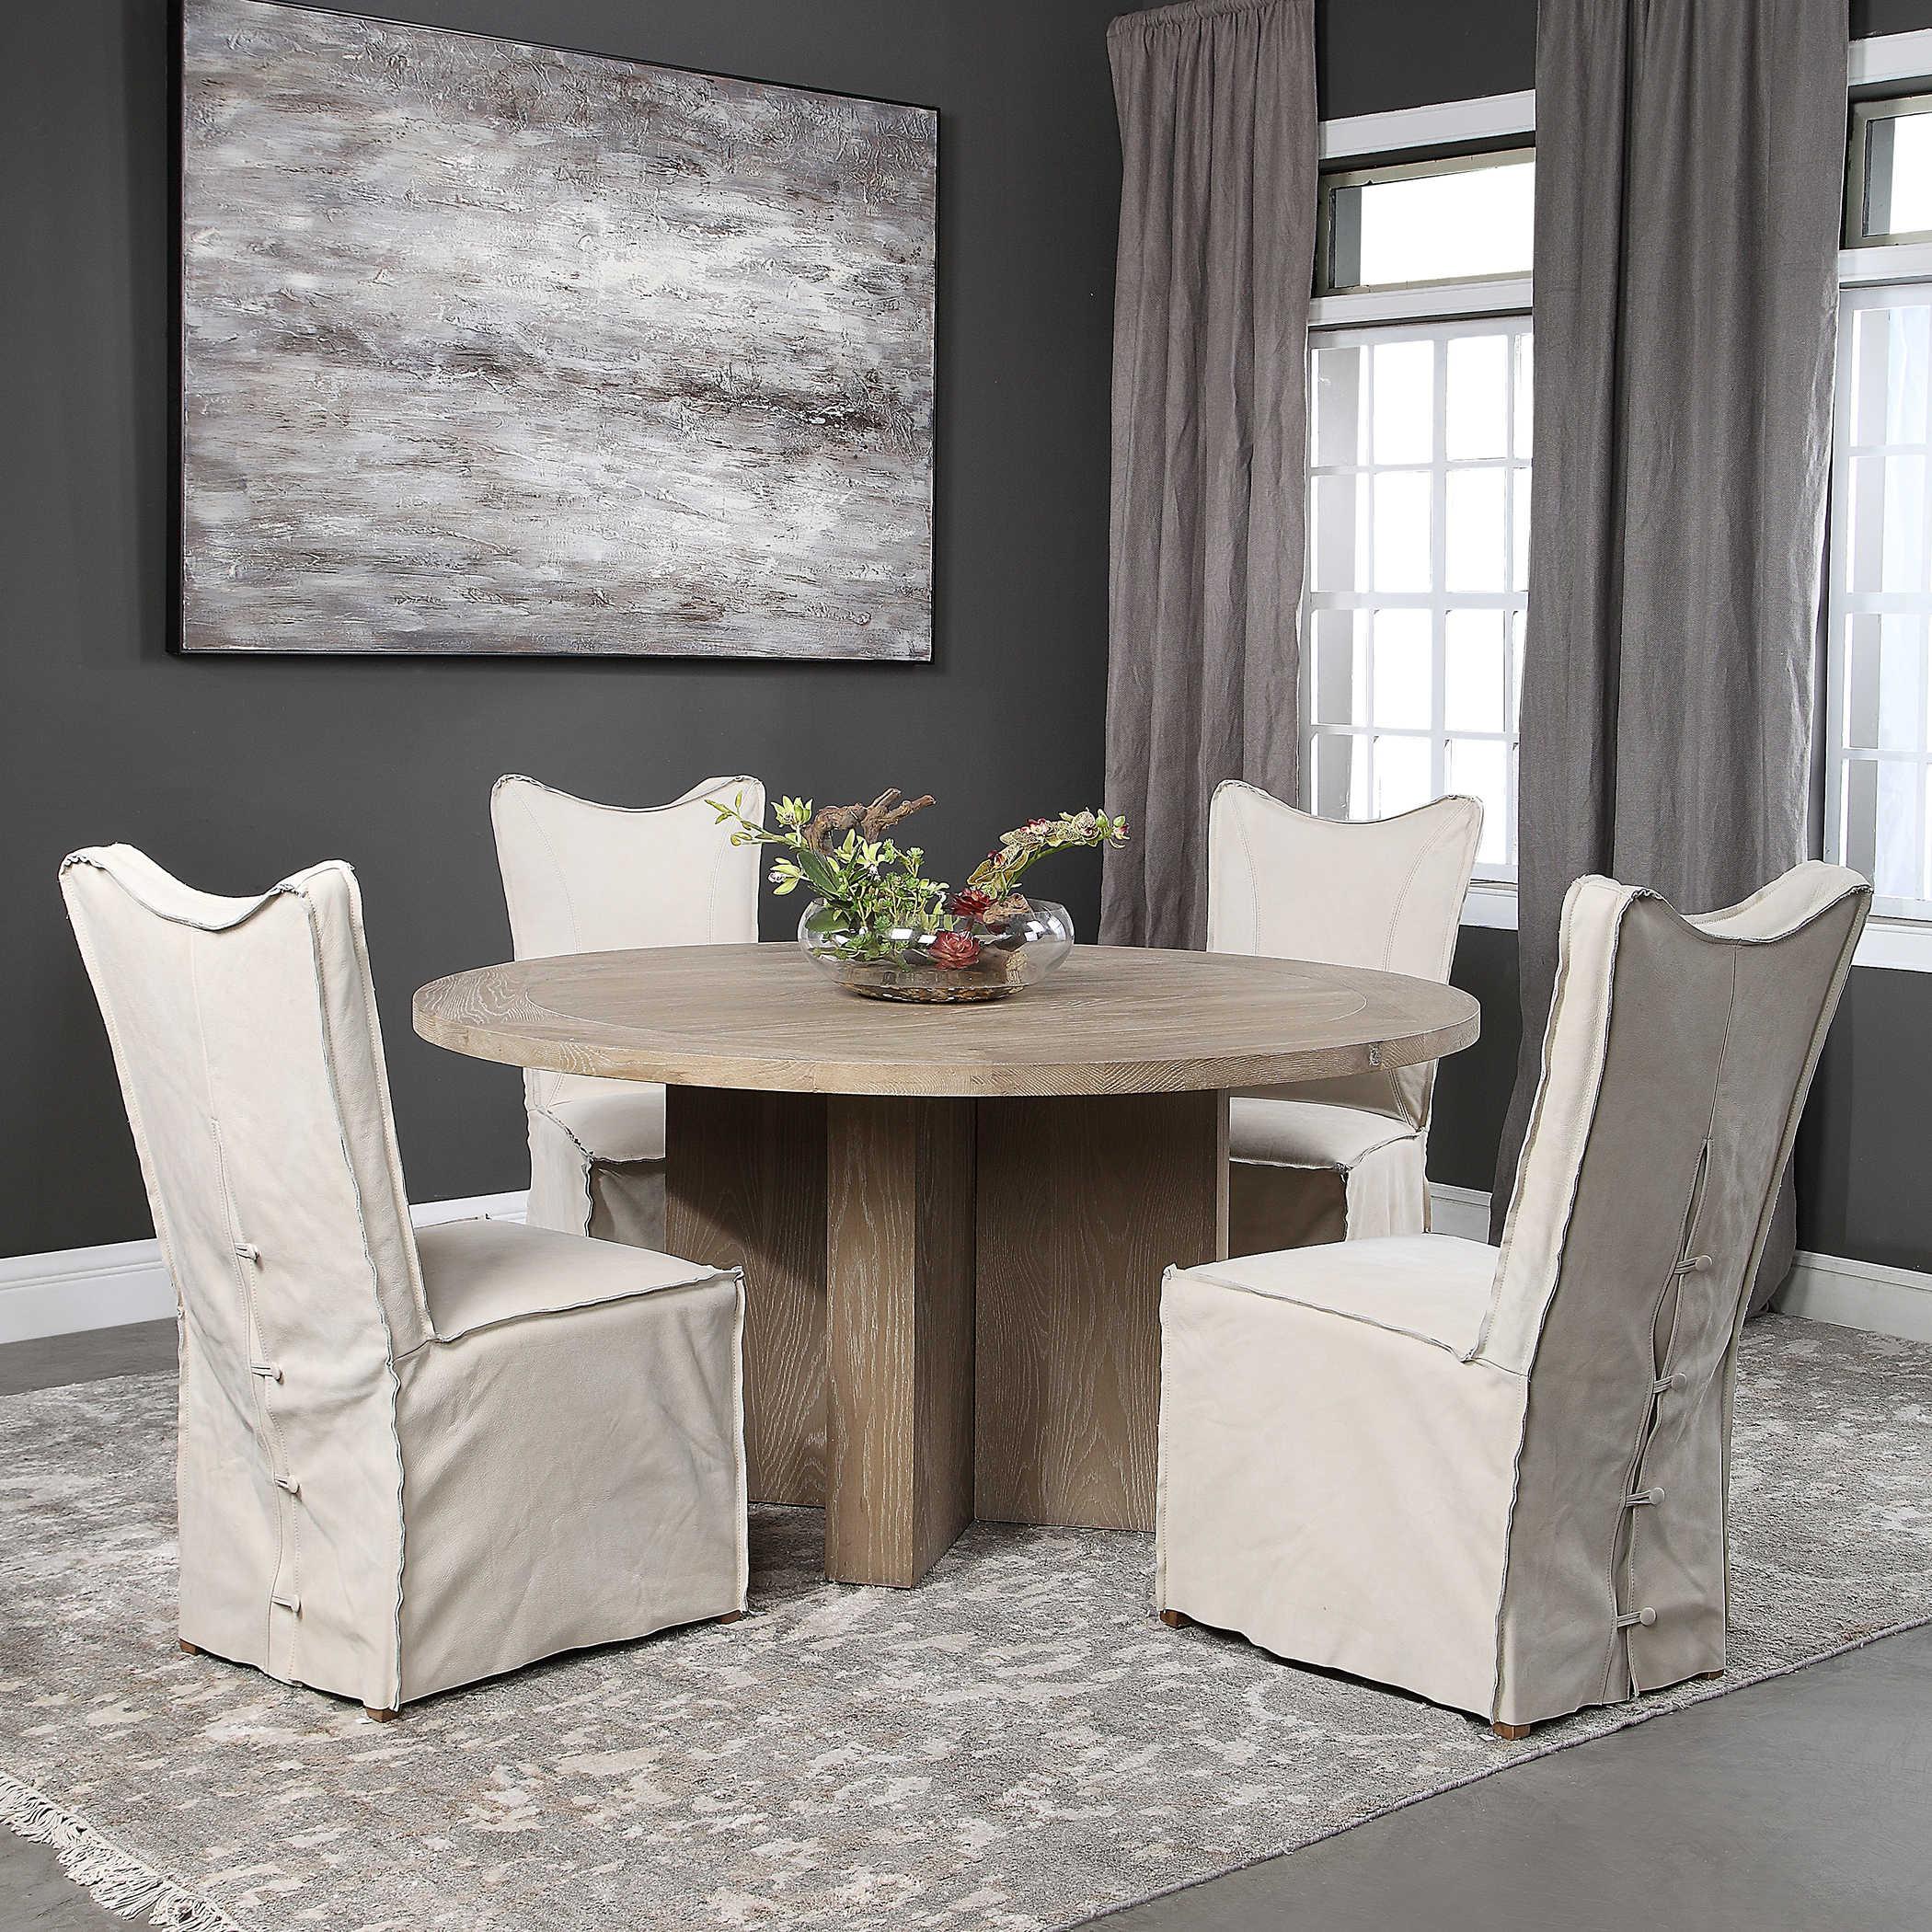 Agacia Dining Table, 2 Cartons